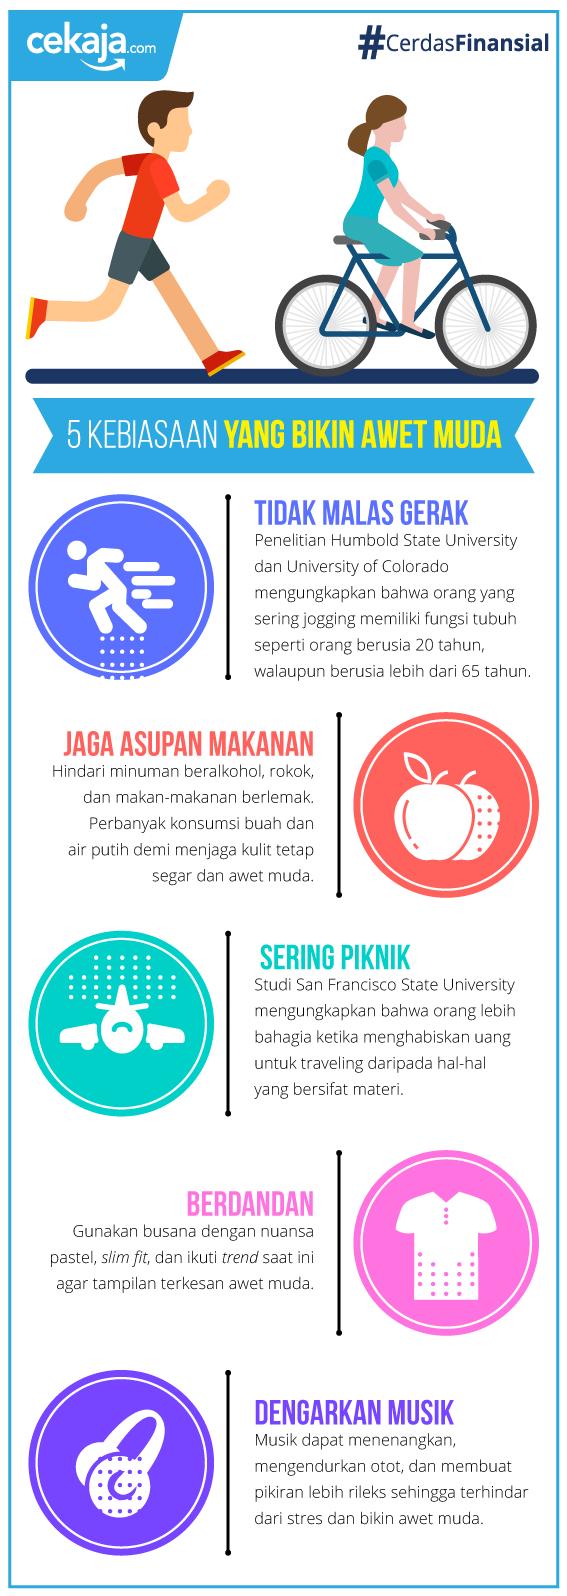 infografis-kebiasaan bikin awet muda - CekAja.com